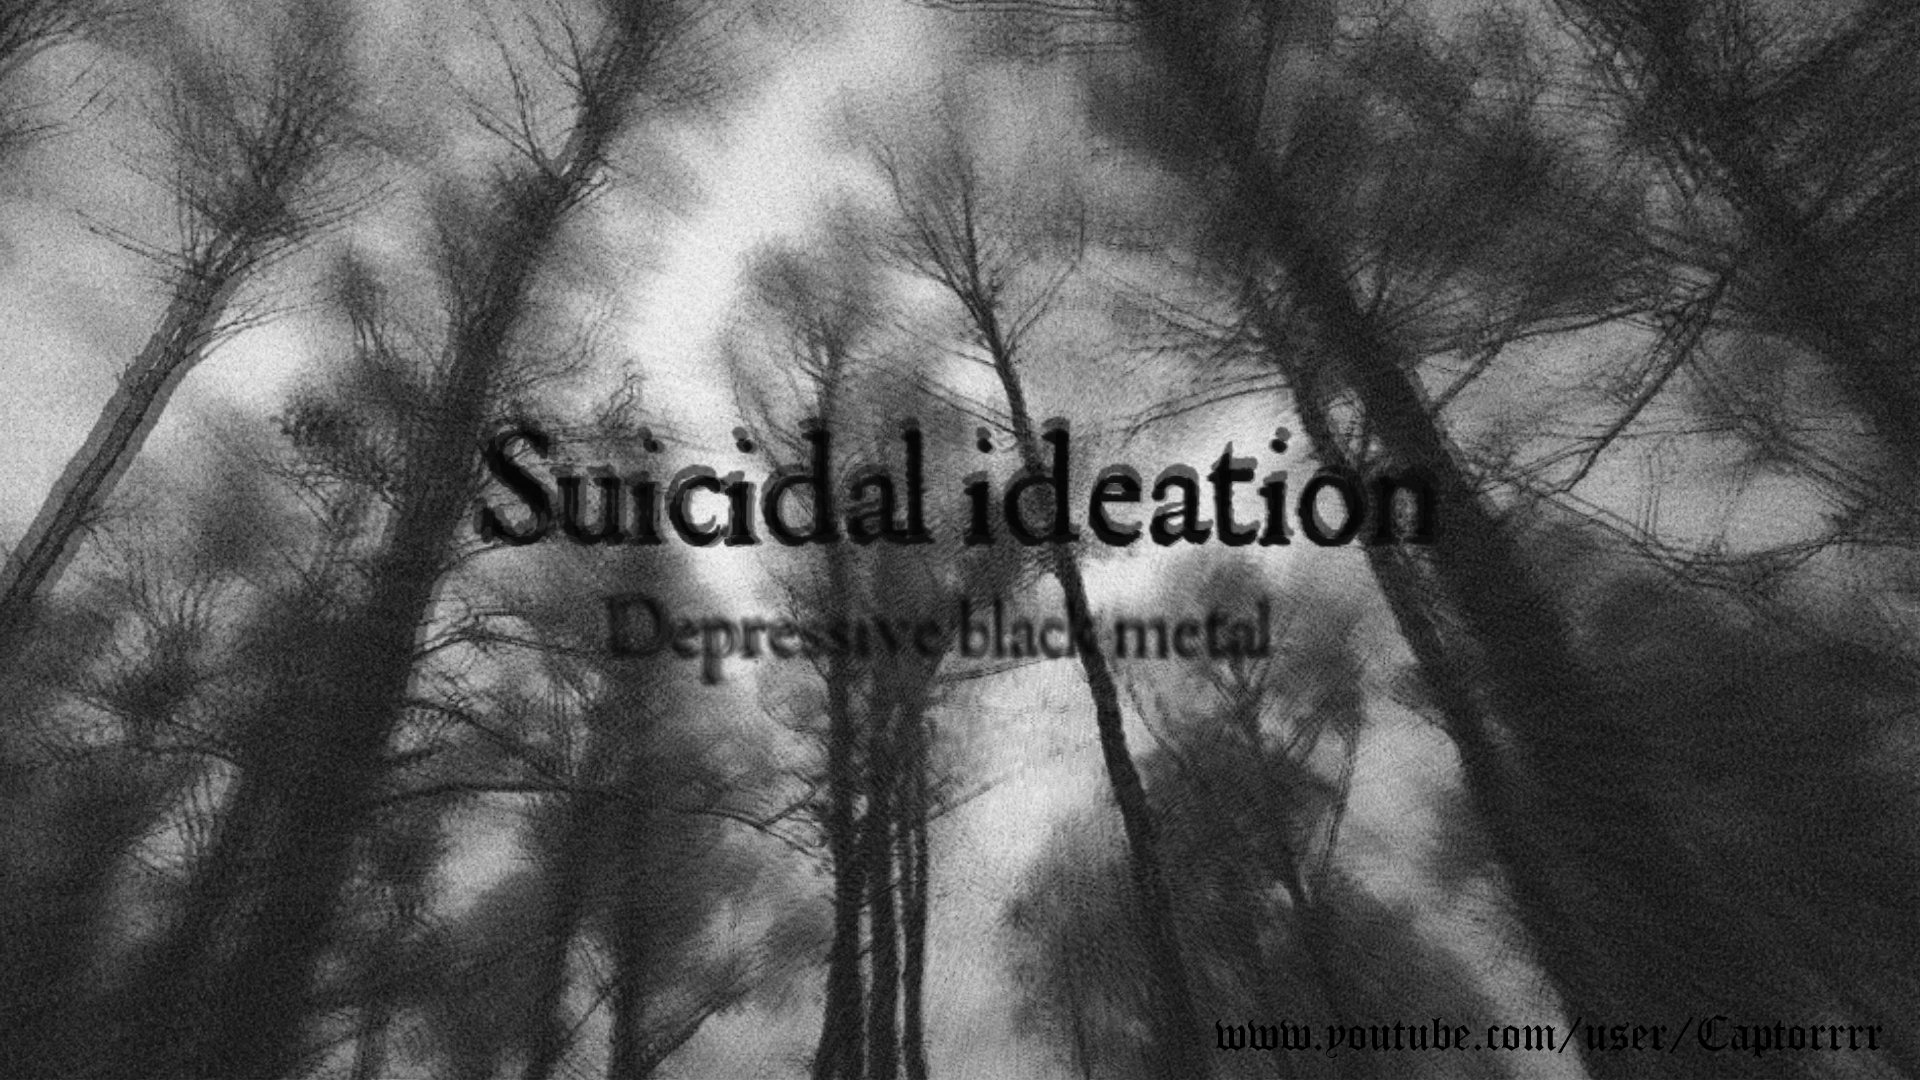 Quotes Wallpaper App Suicidal Ideation Depressive Black Metal